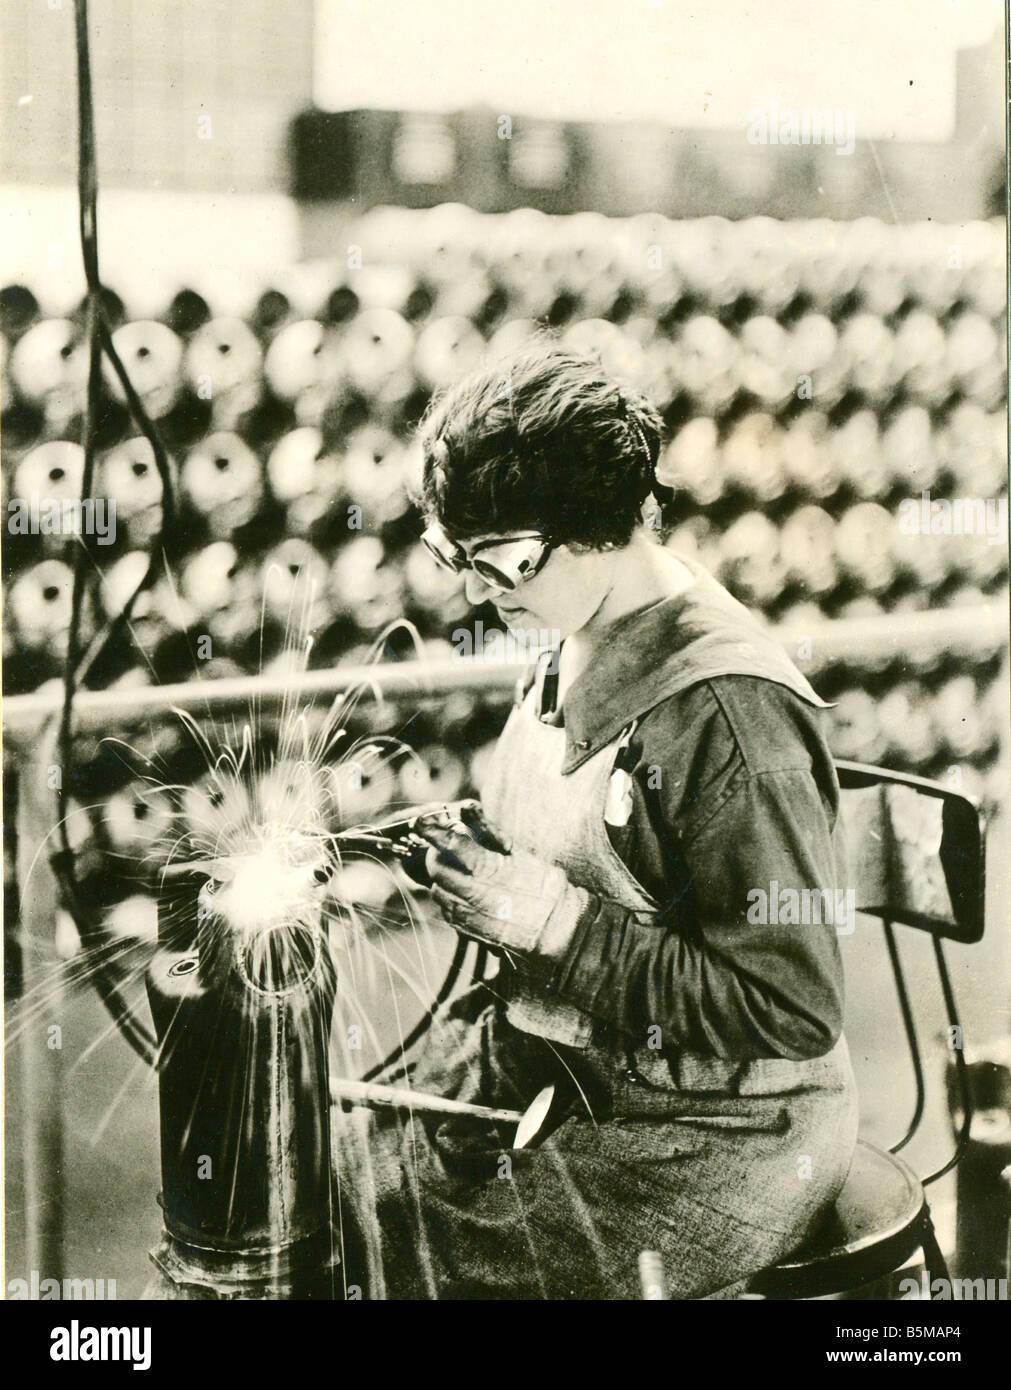 2 M146 R1 1918 B USA Female worker welding 1918 Women at work Armaments industry USA Female worker welding the shell - Stock Image